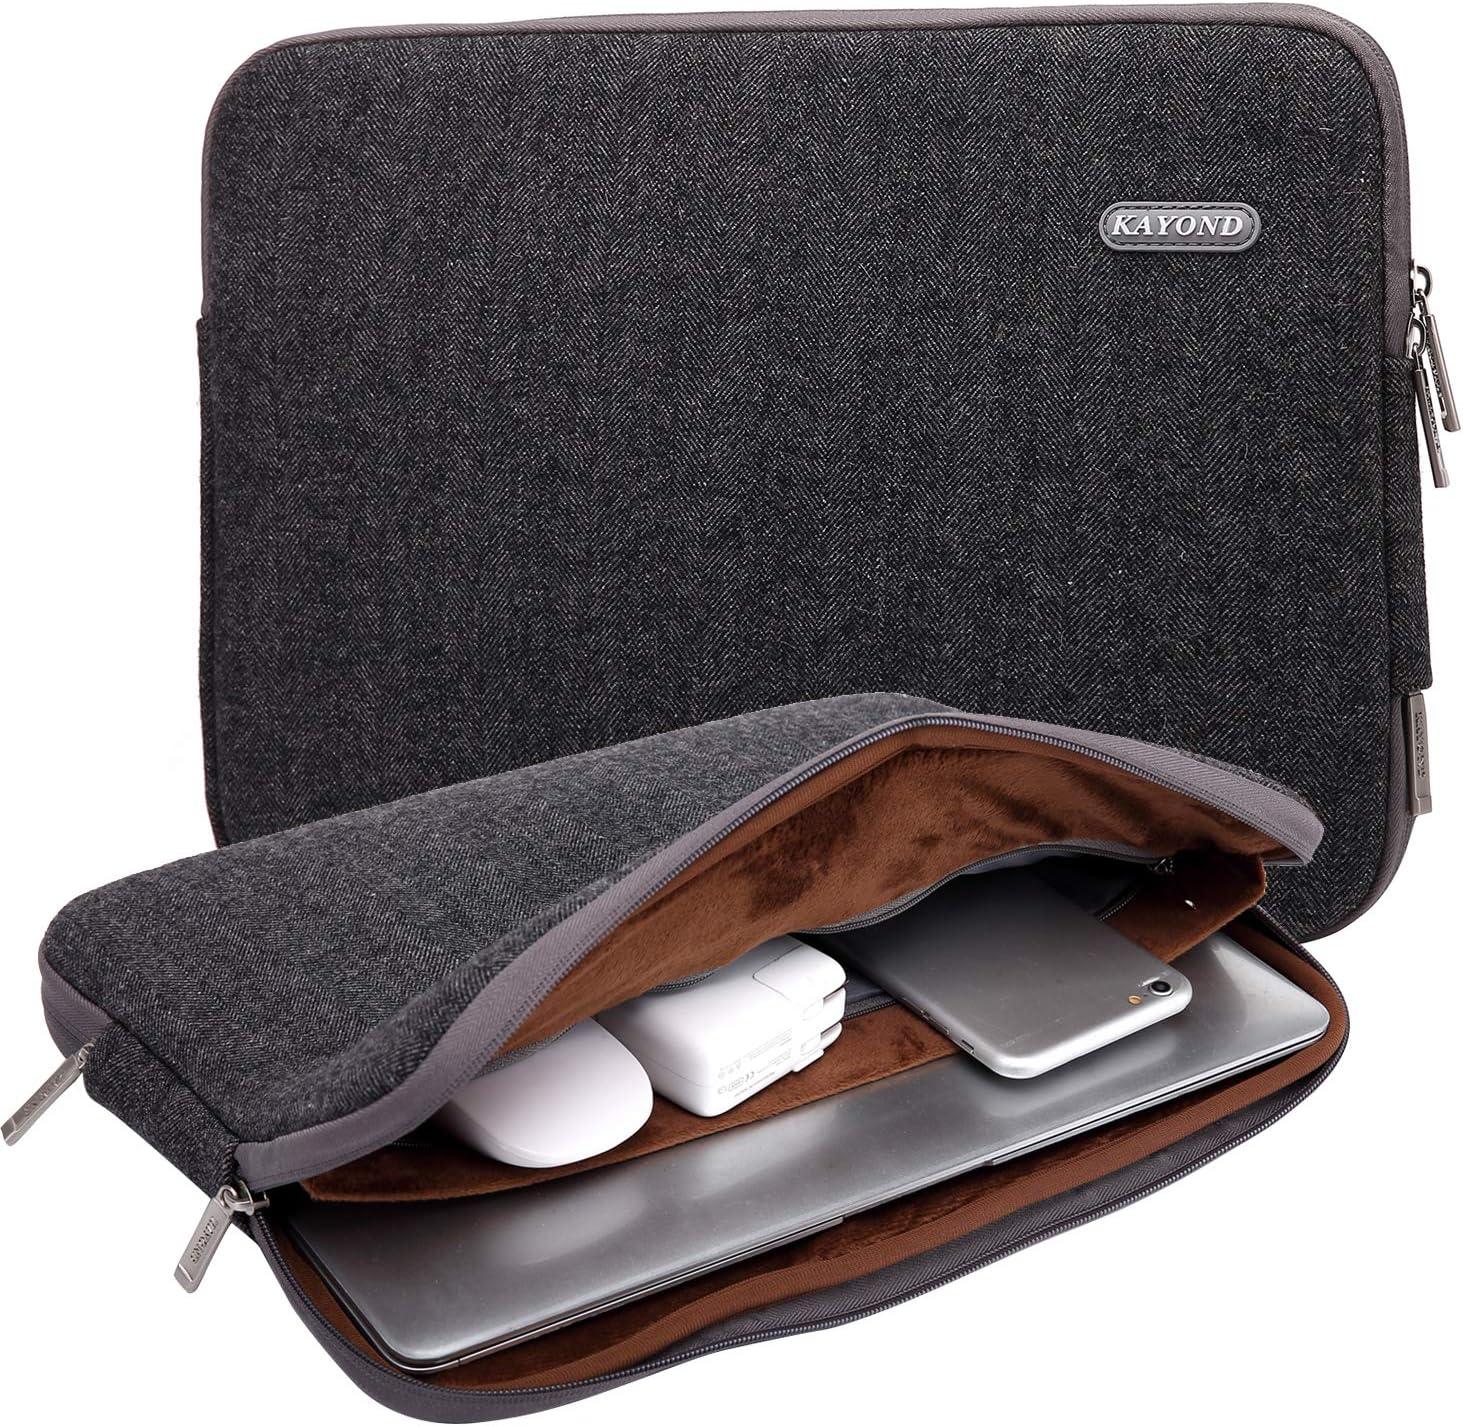 KAYOND Herringbone Woollen Water Repellent for 11-11.6 Inch Laptop Sleeve Case Bag (11-11.6 Inches, Black)